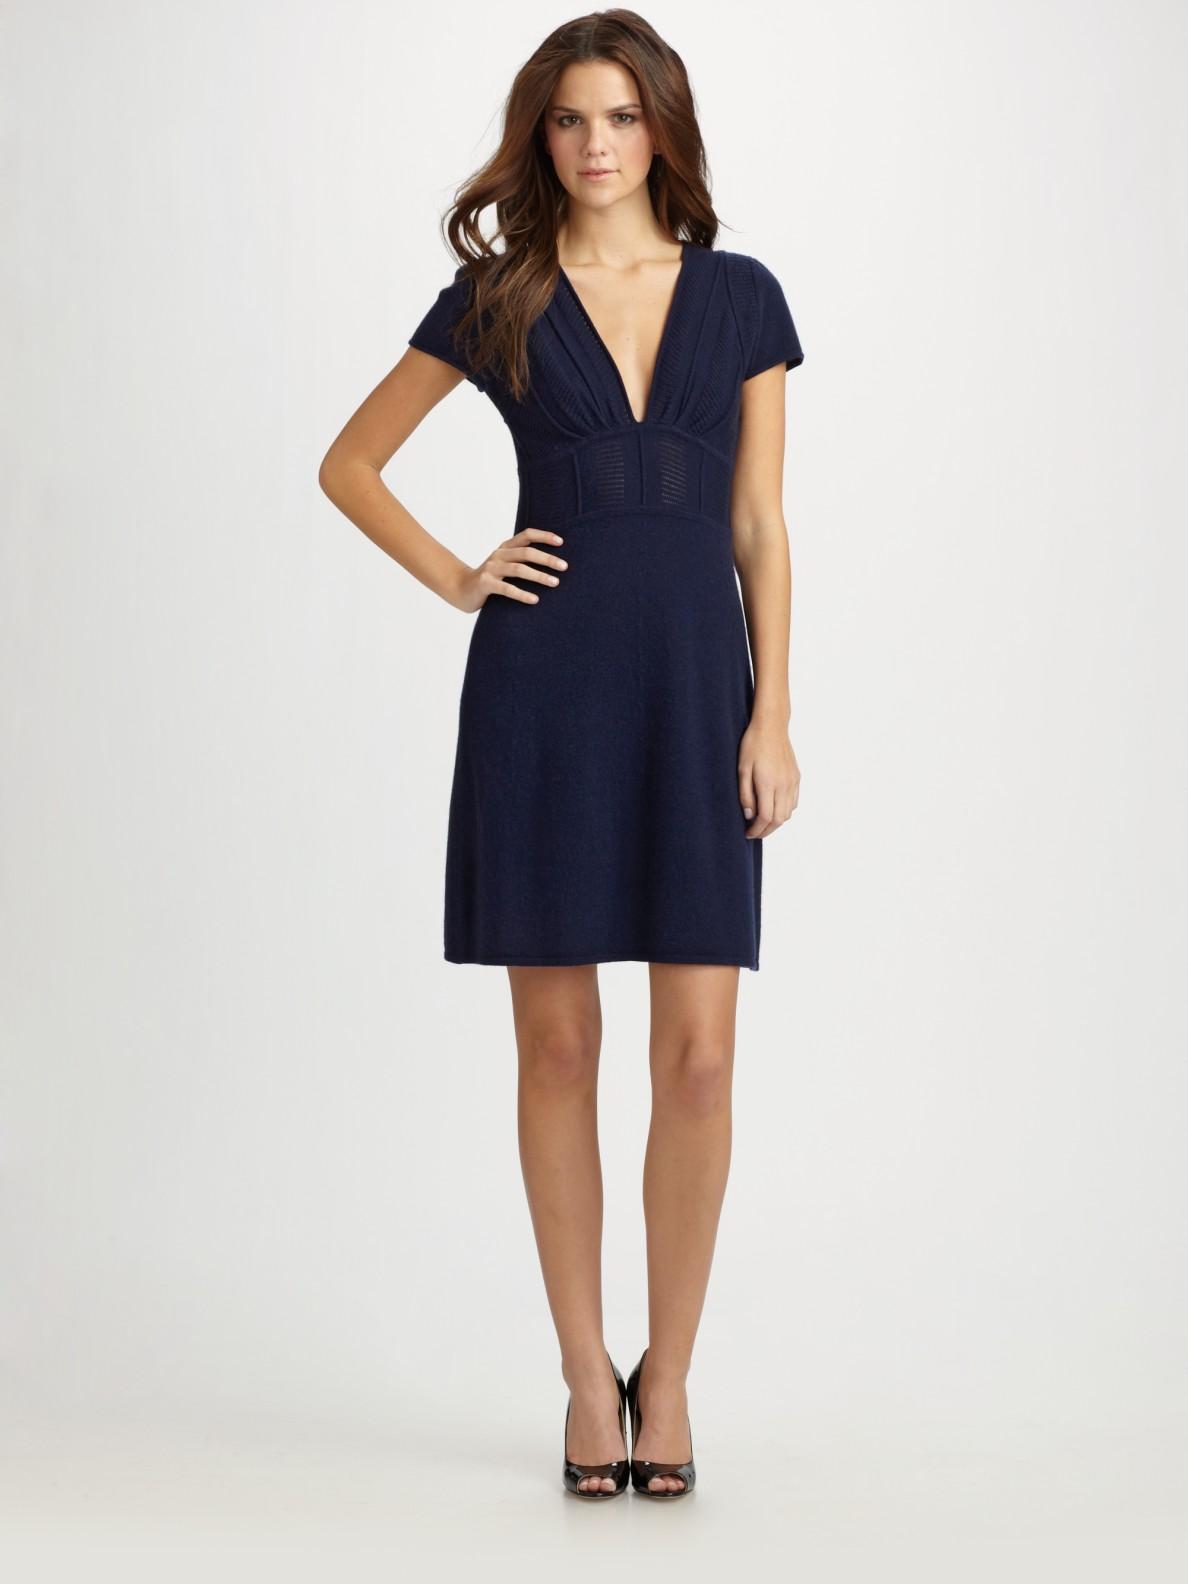 Lyst Catherine Malandrino Silk Chiffon Dress In Blue